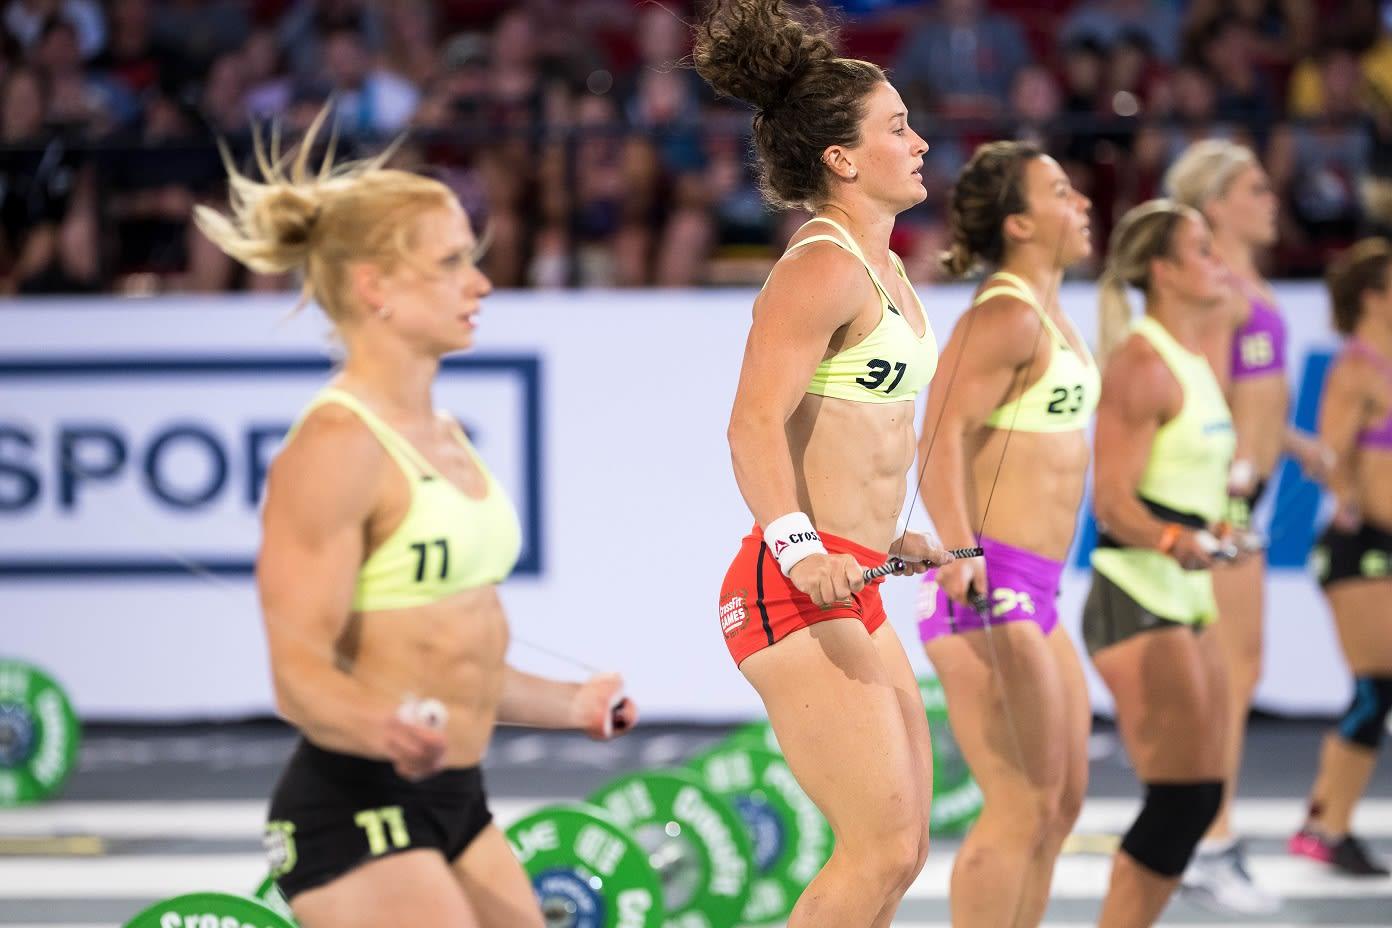 cfgames-roundup-womens-race